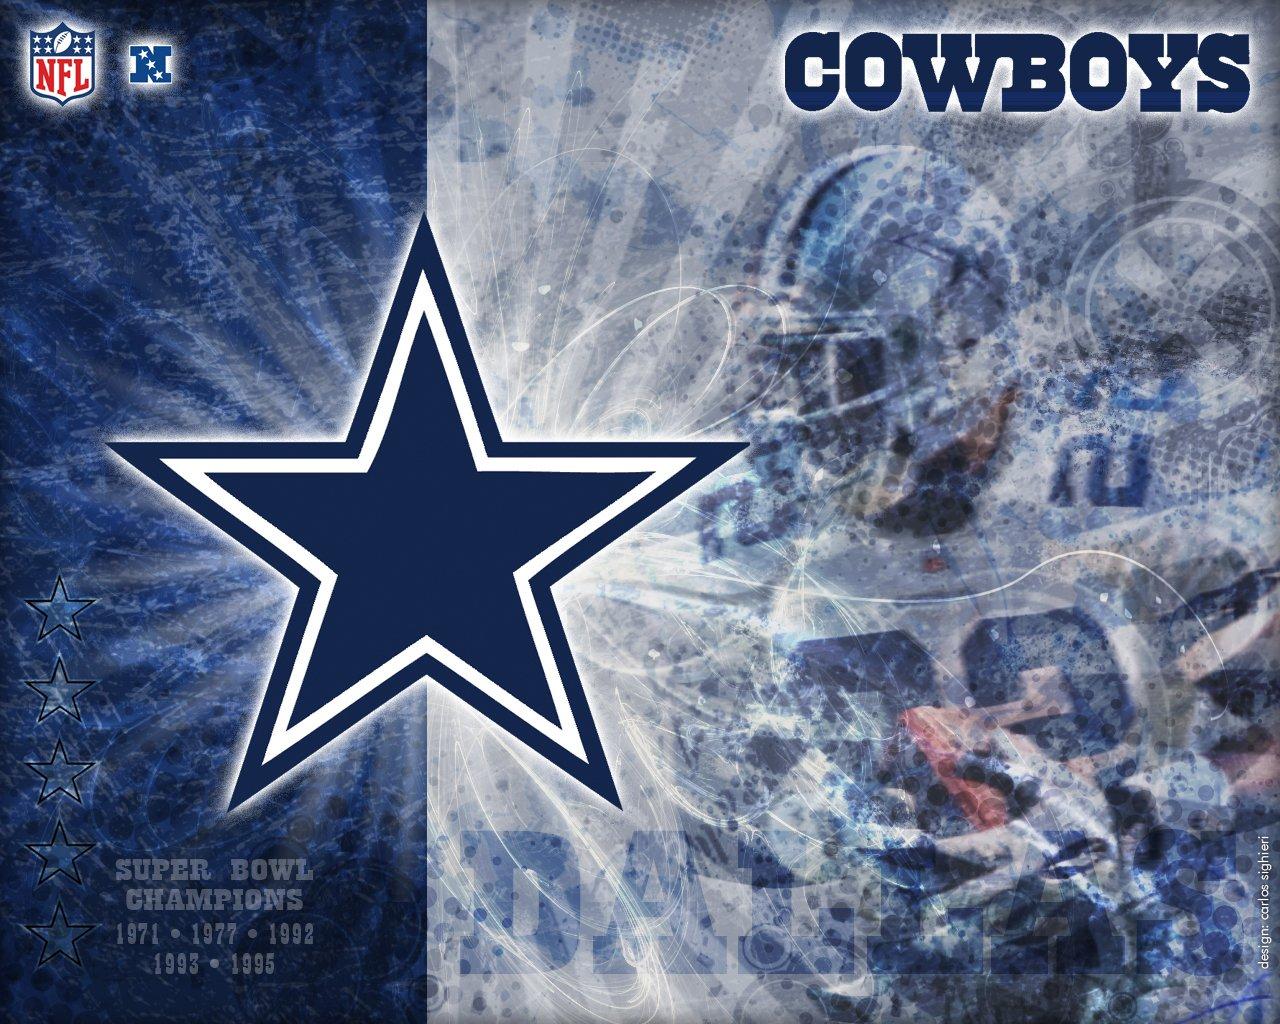 Dallas Cowboys wallpaper HD images Dallas Cowboys wallpapers